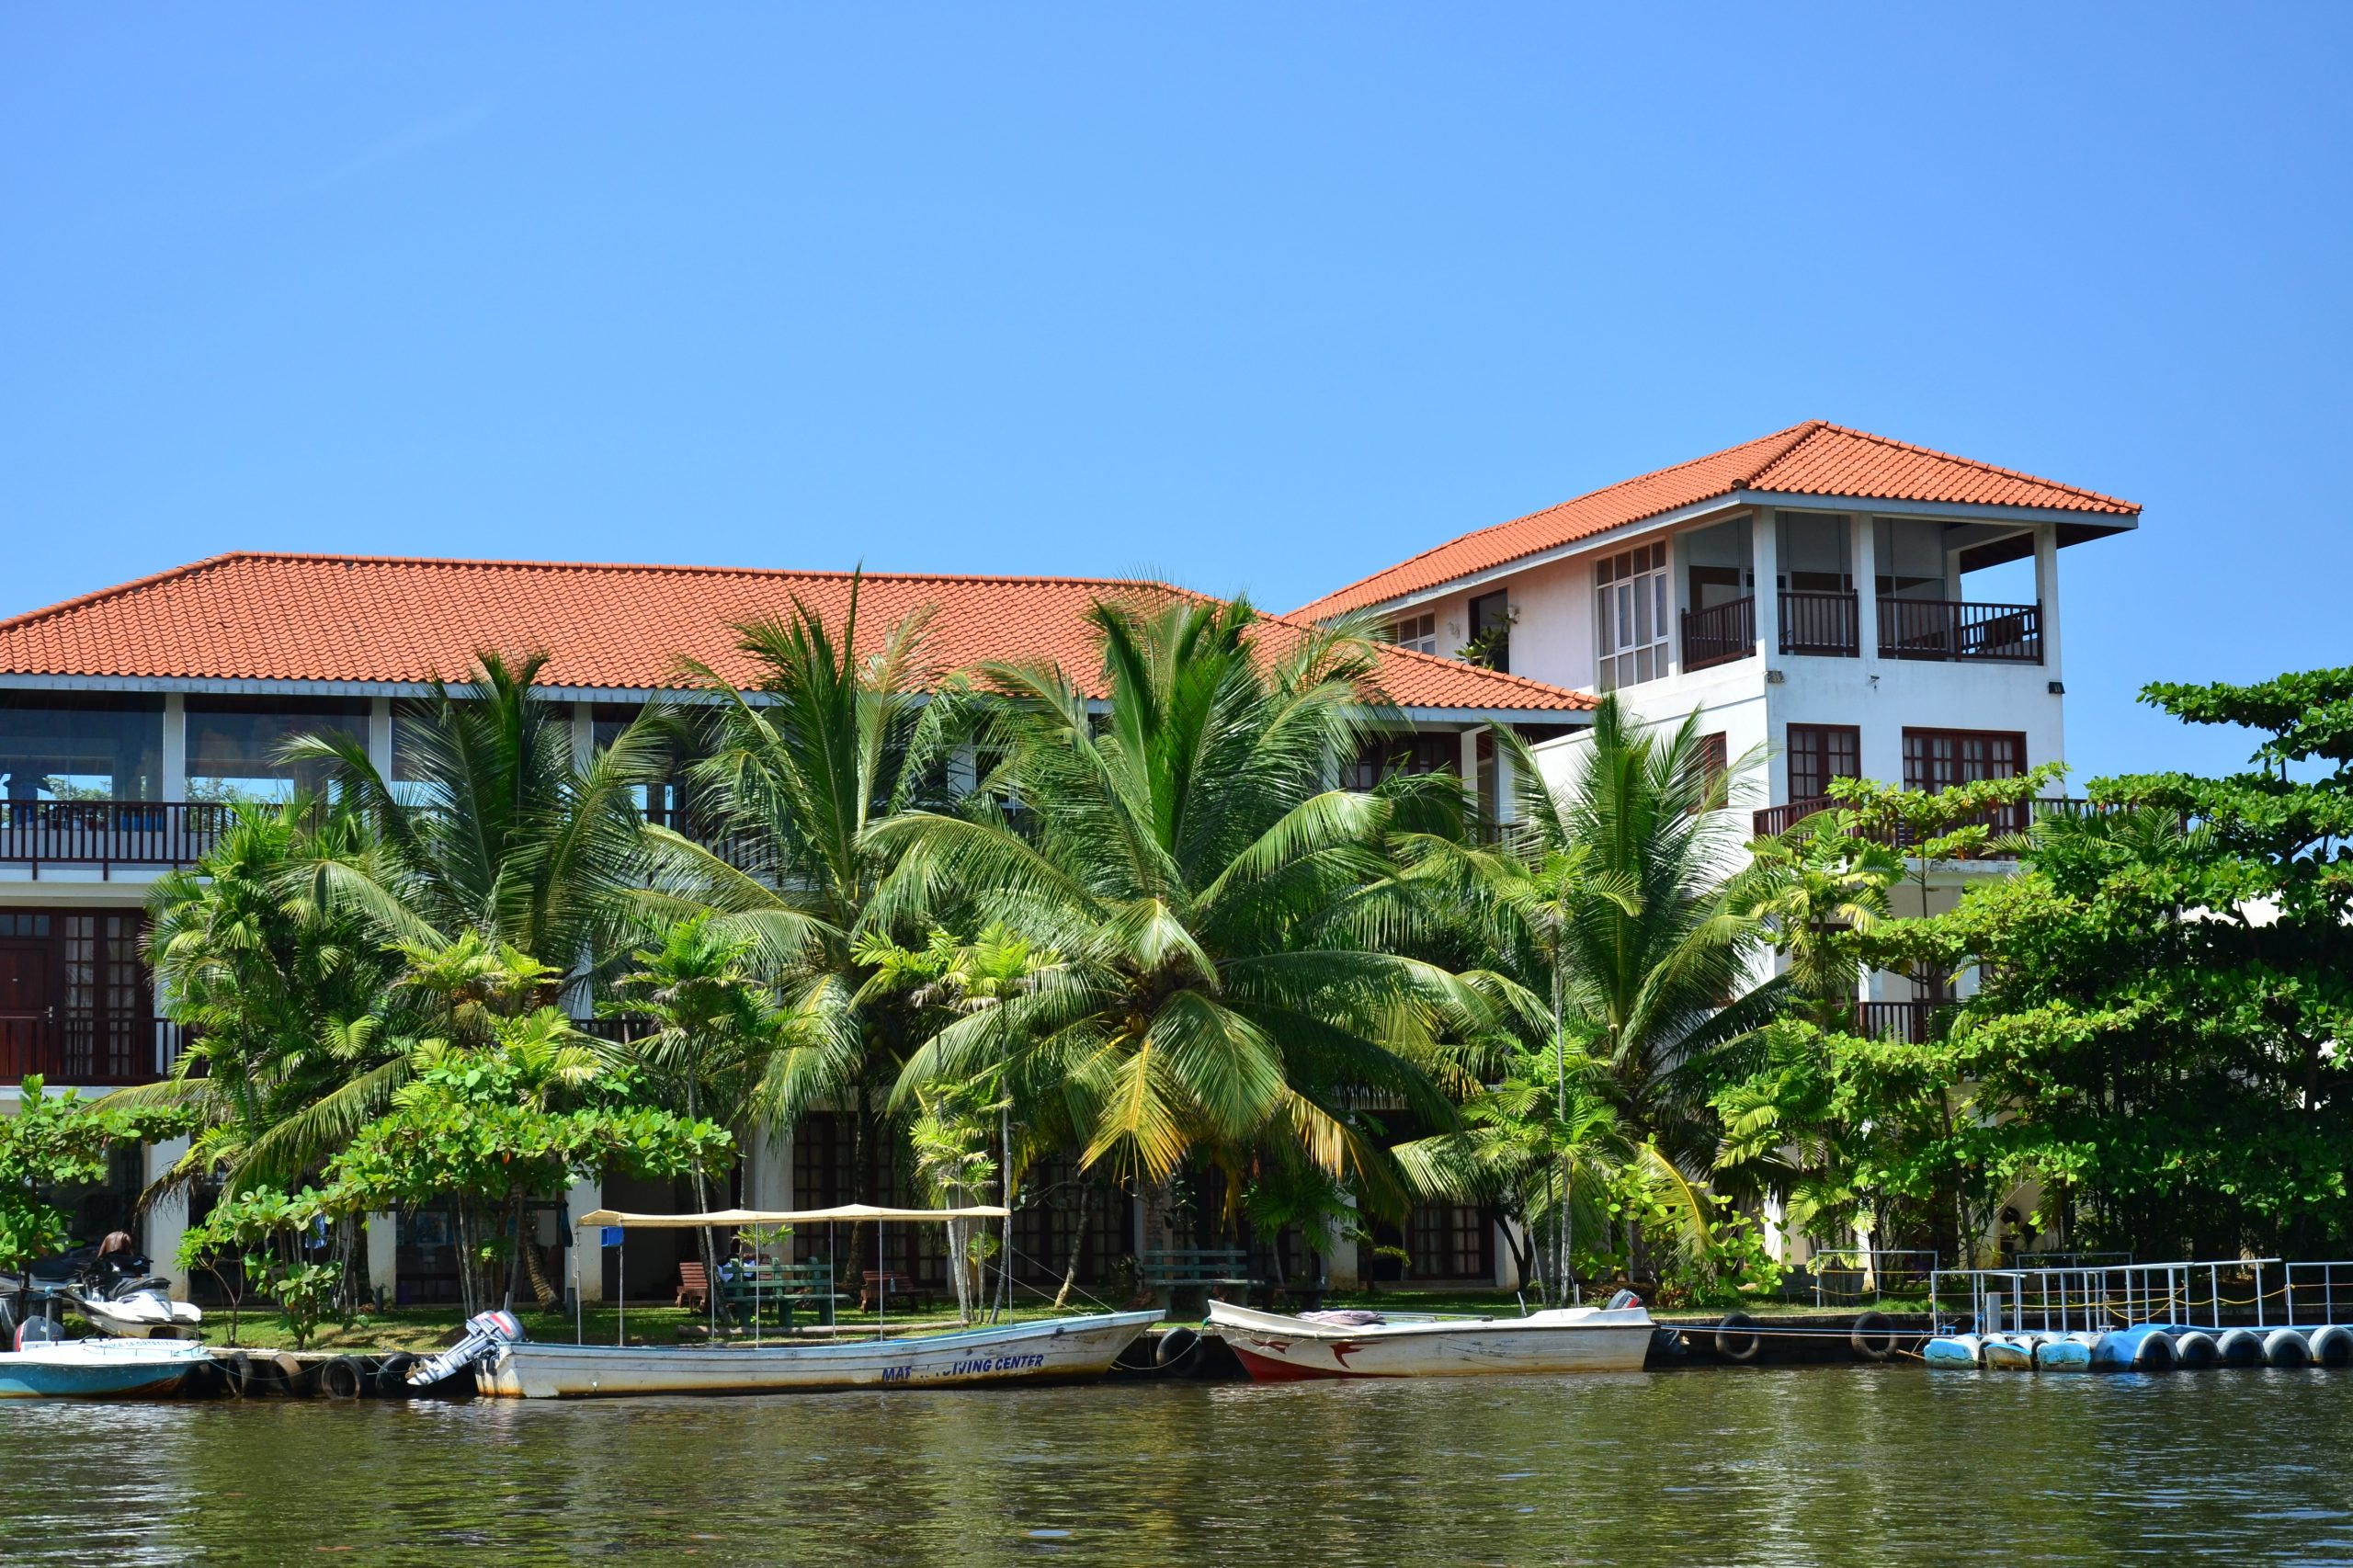 Sri Lanka Bentota Hotel Marina Aussenansicht